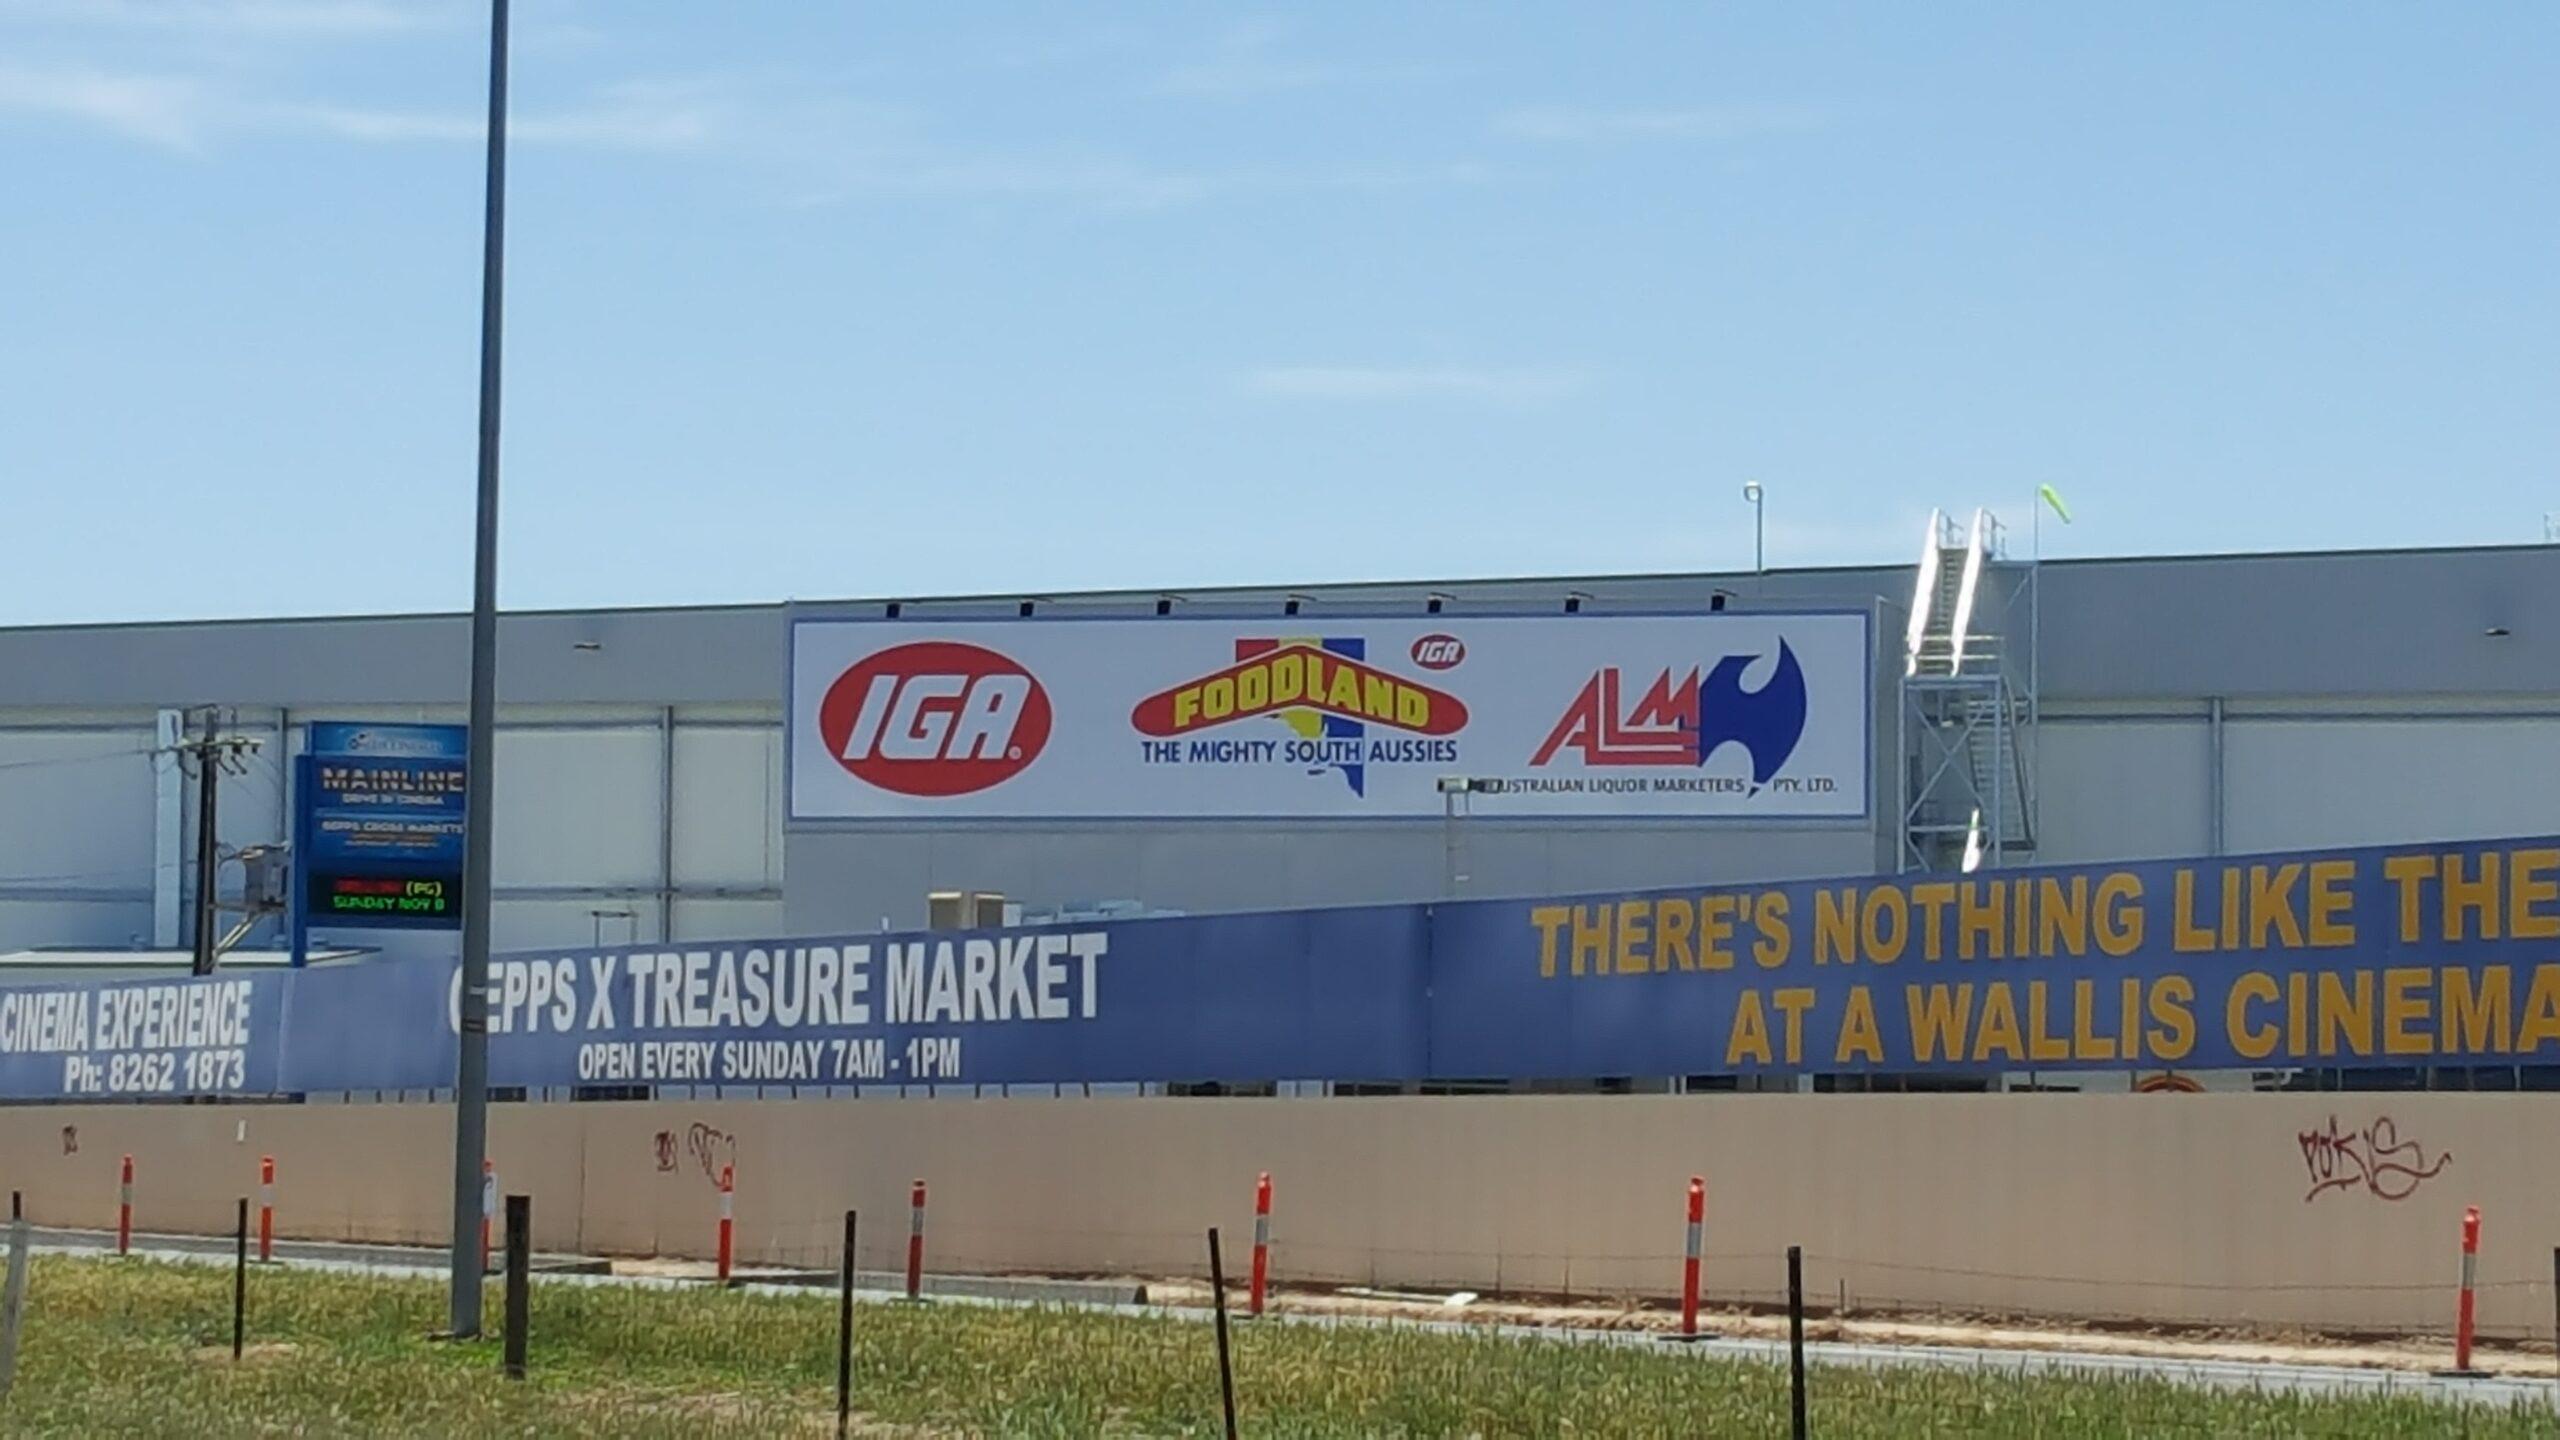 custom fascia sign on outside of warehouse in Adelaide